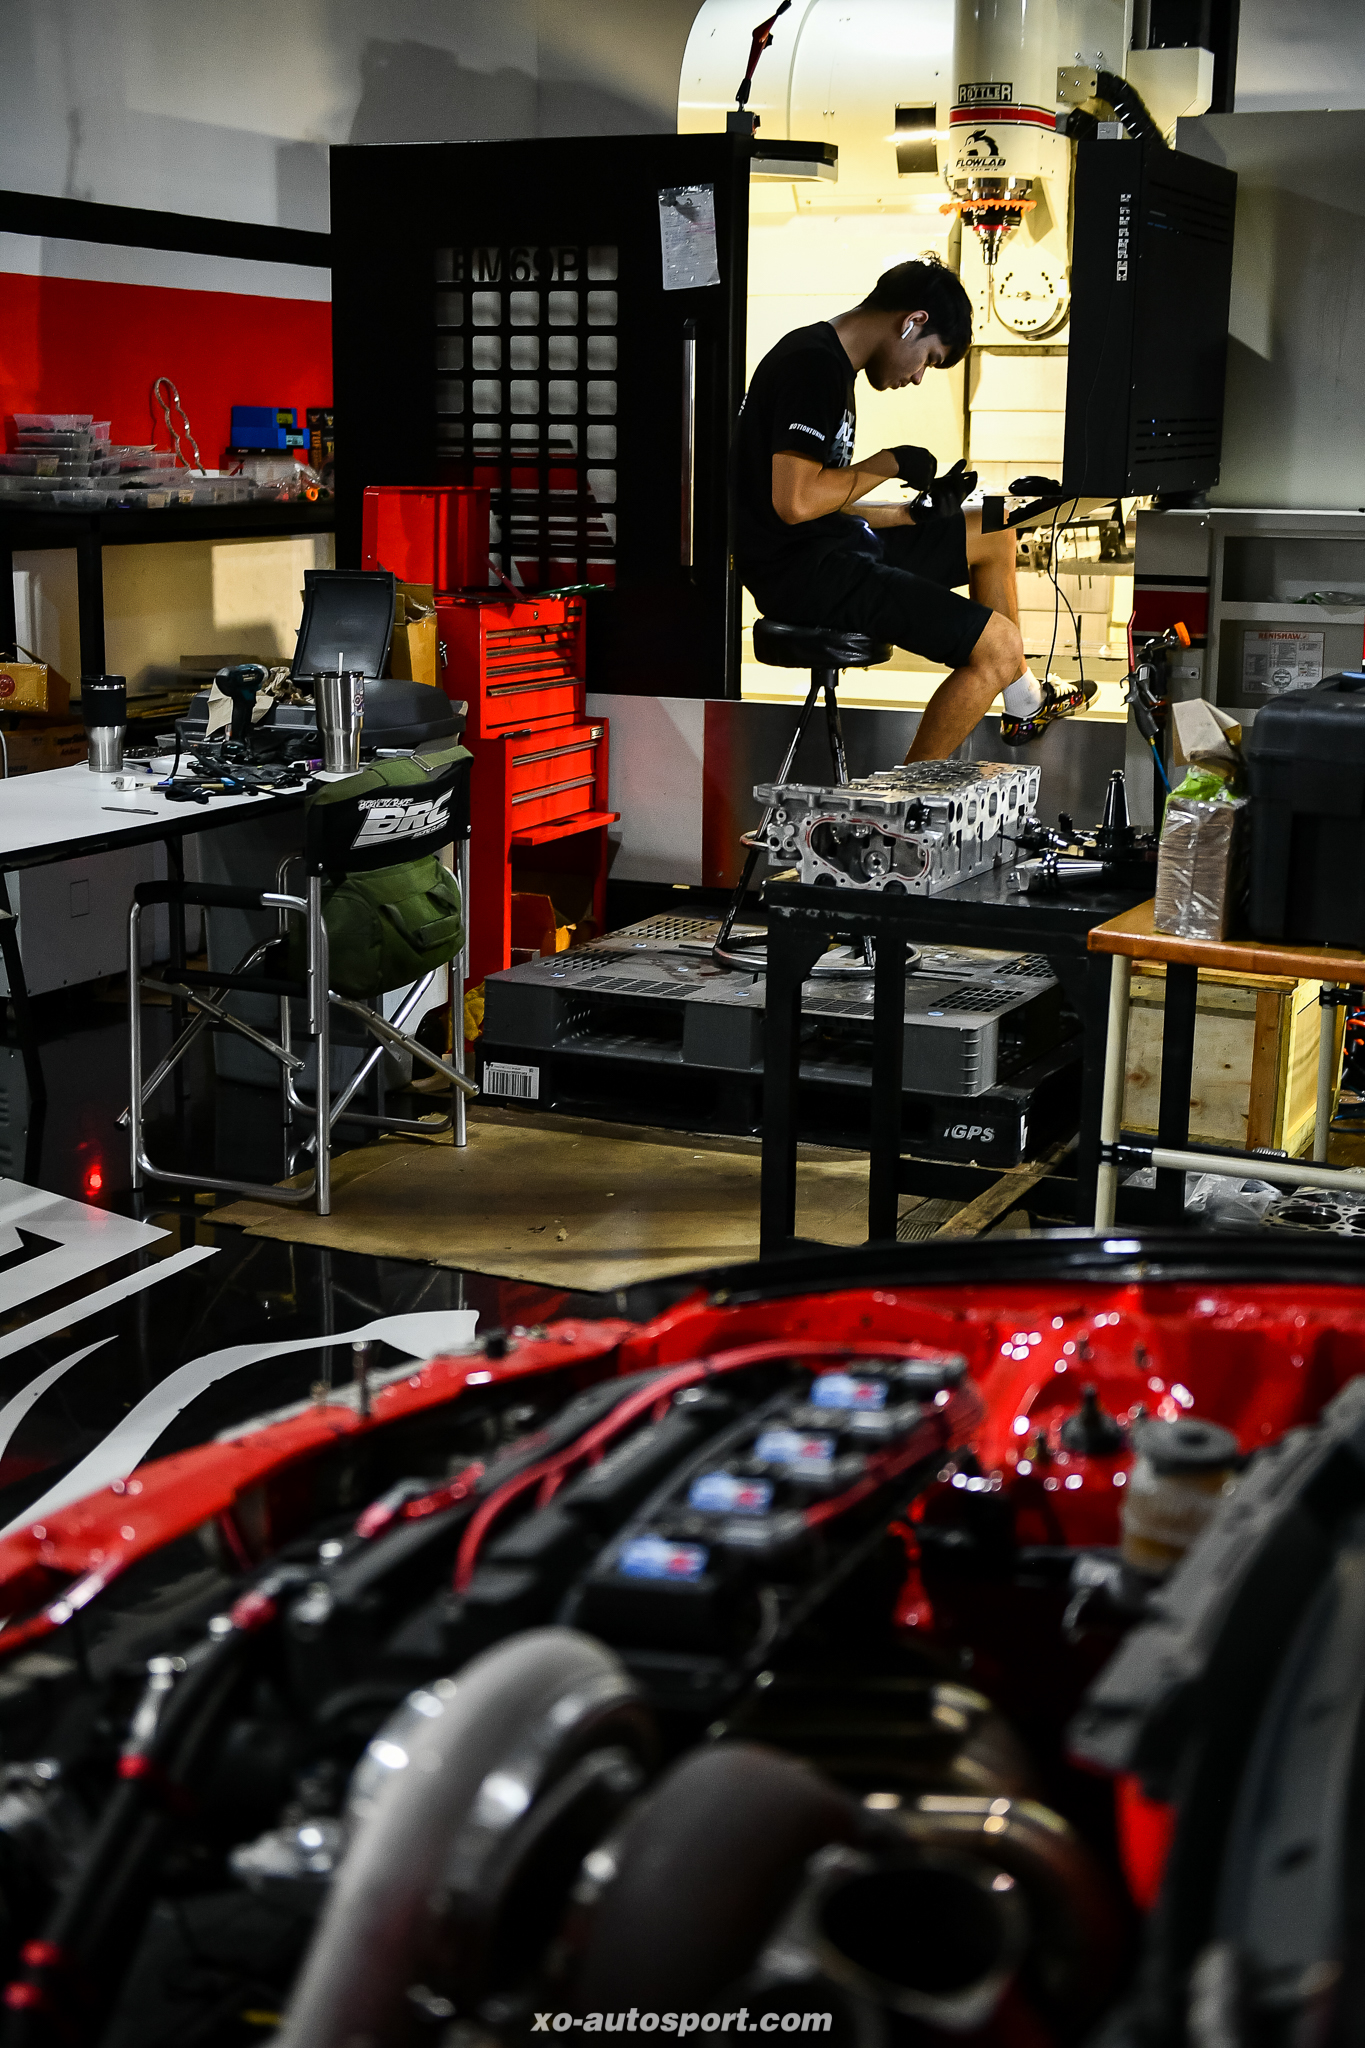 INTEGRA DC2 PRO 4 FWD Champion by FLOW LAB CNC 38